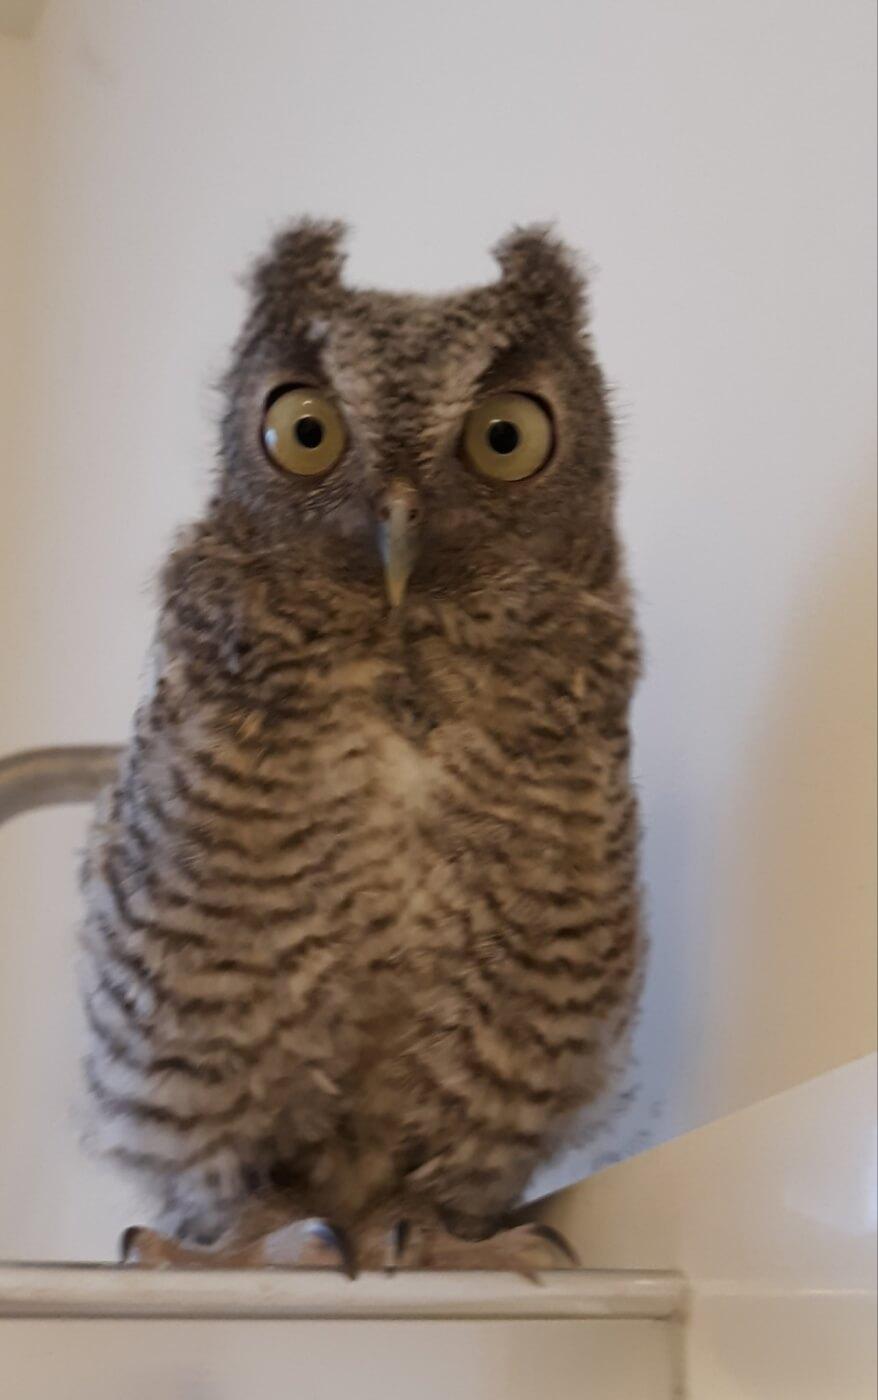 PETA Helps Owl